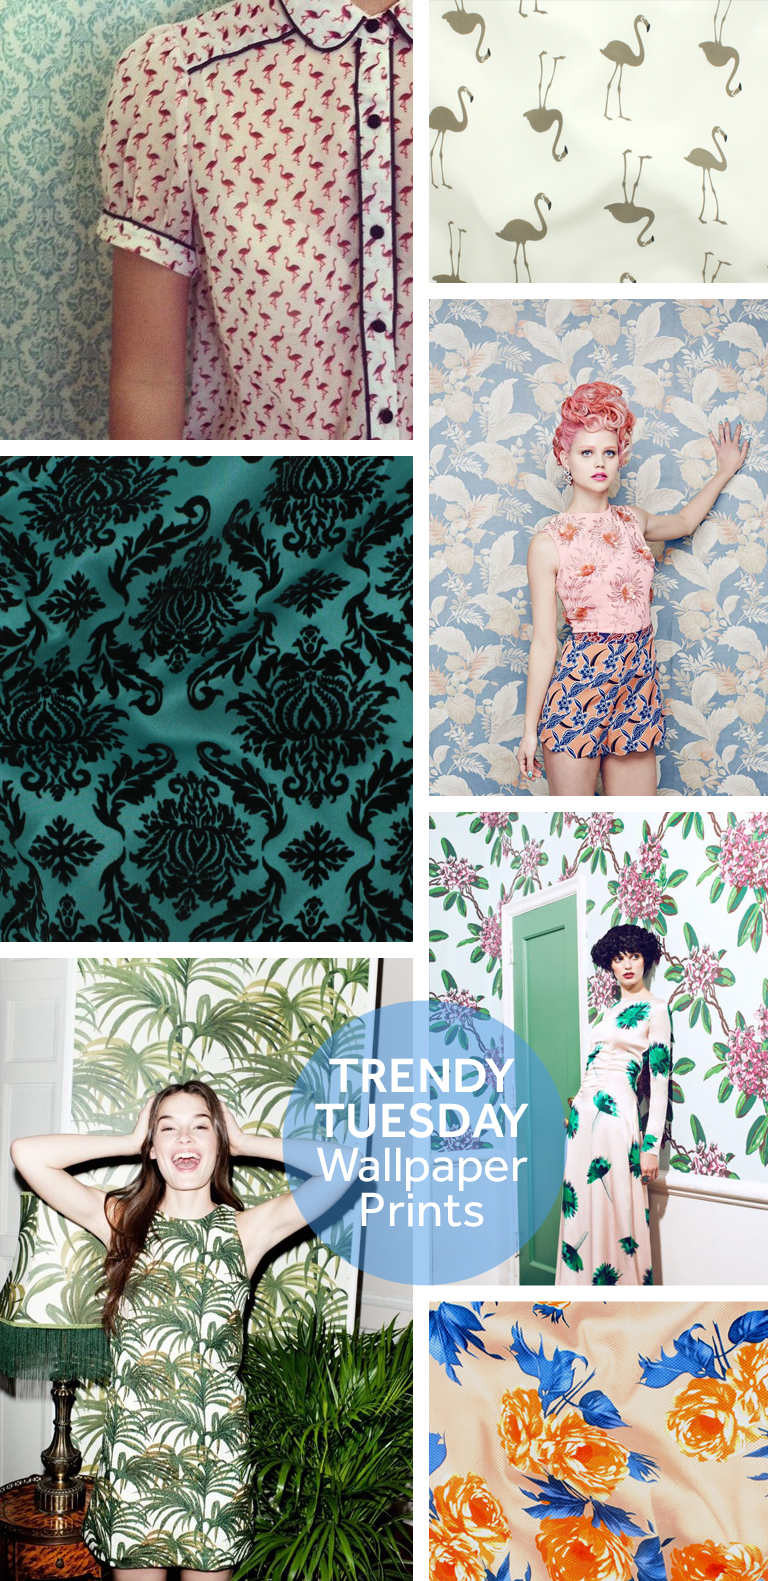 wallpaper-print-fashion-trend